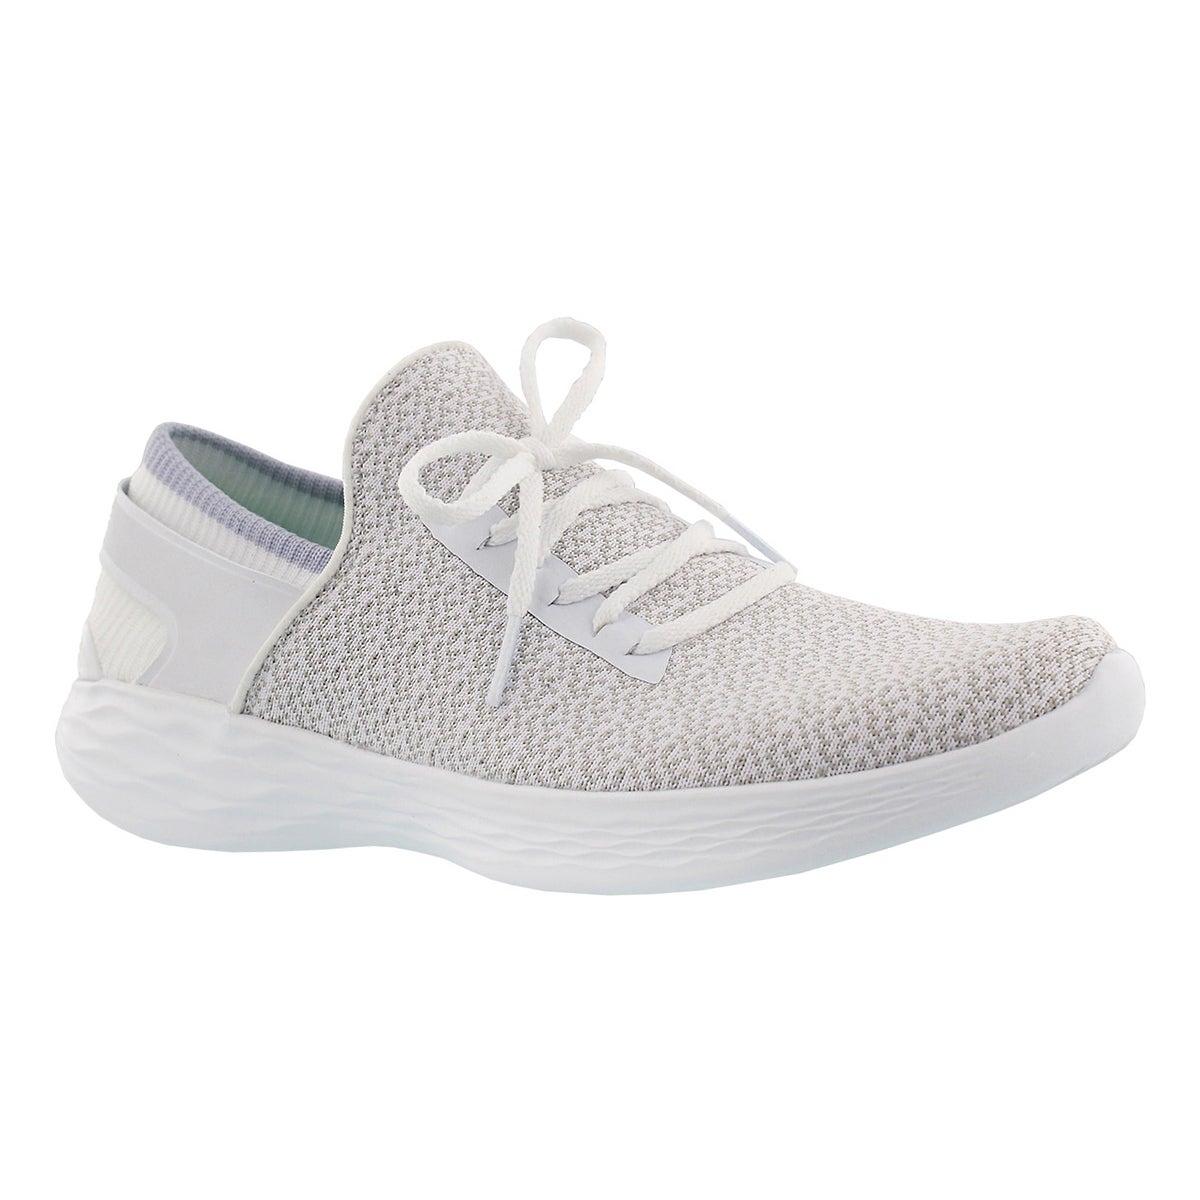 Women's YOU INSPIRE white slip on sneakers